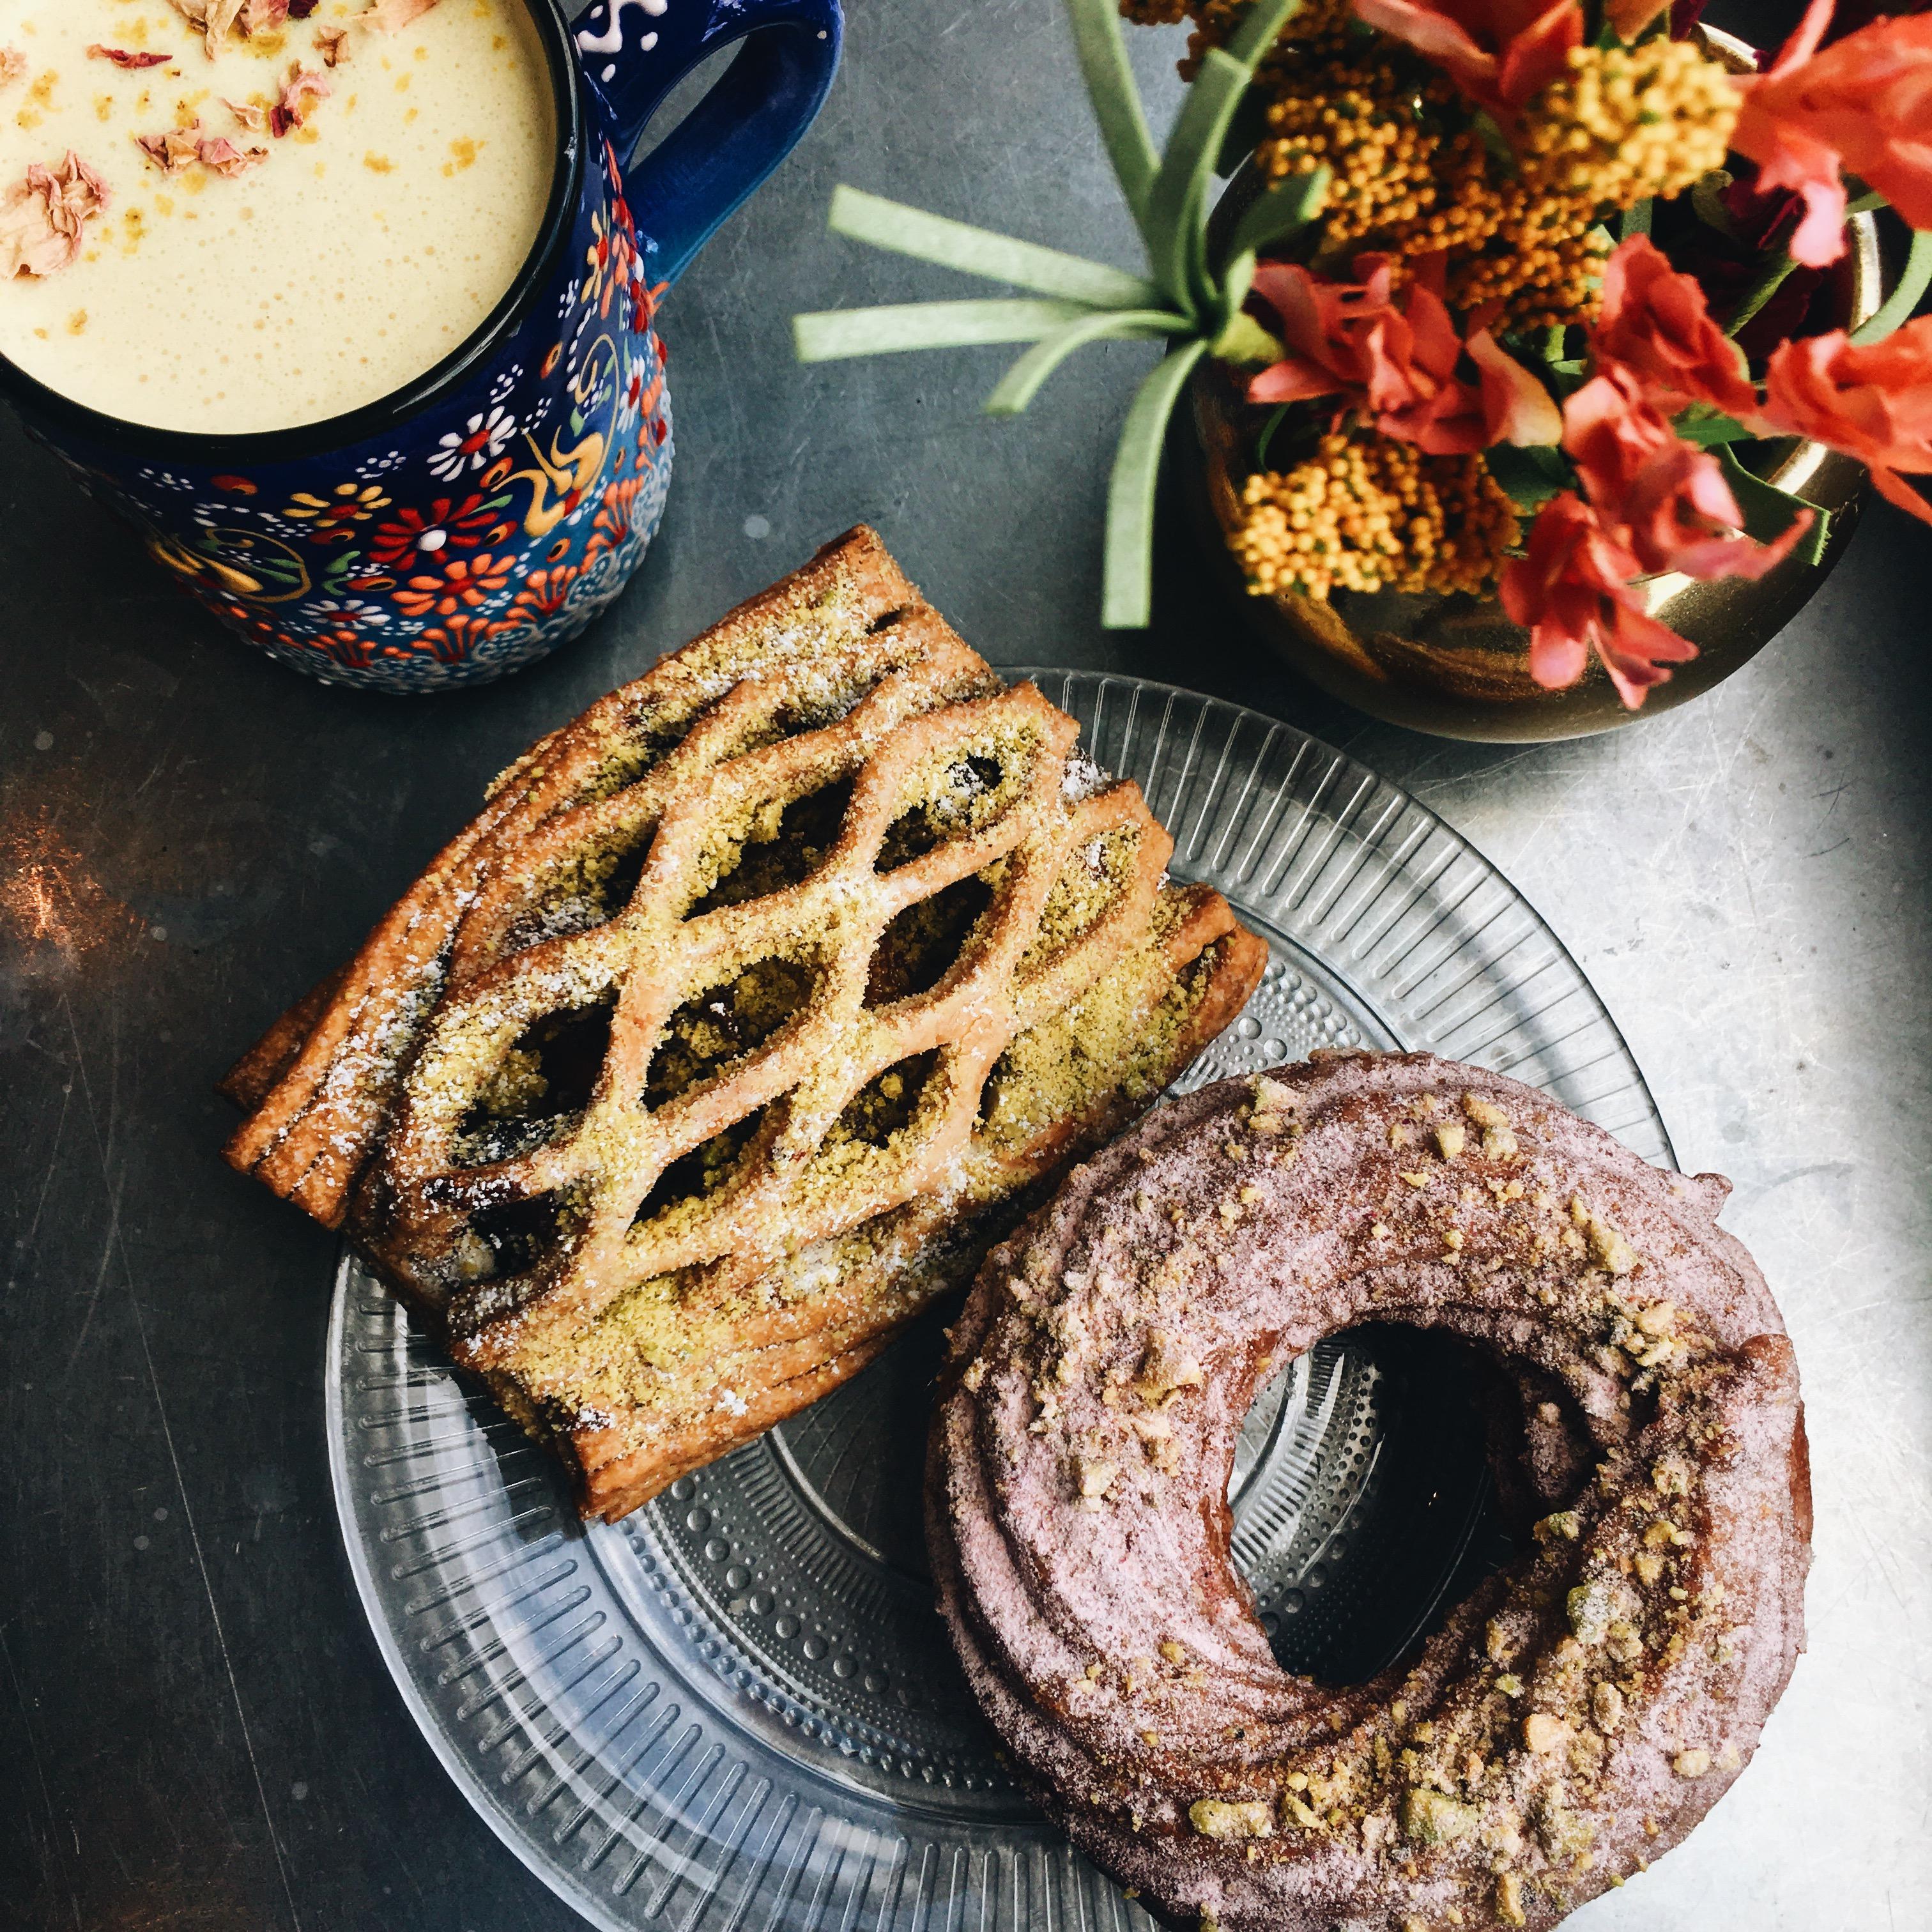 Latte and pastries at Suraya Philadelphia